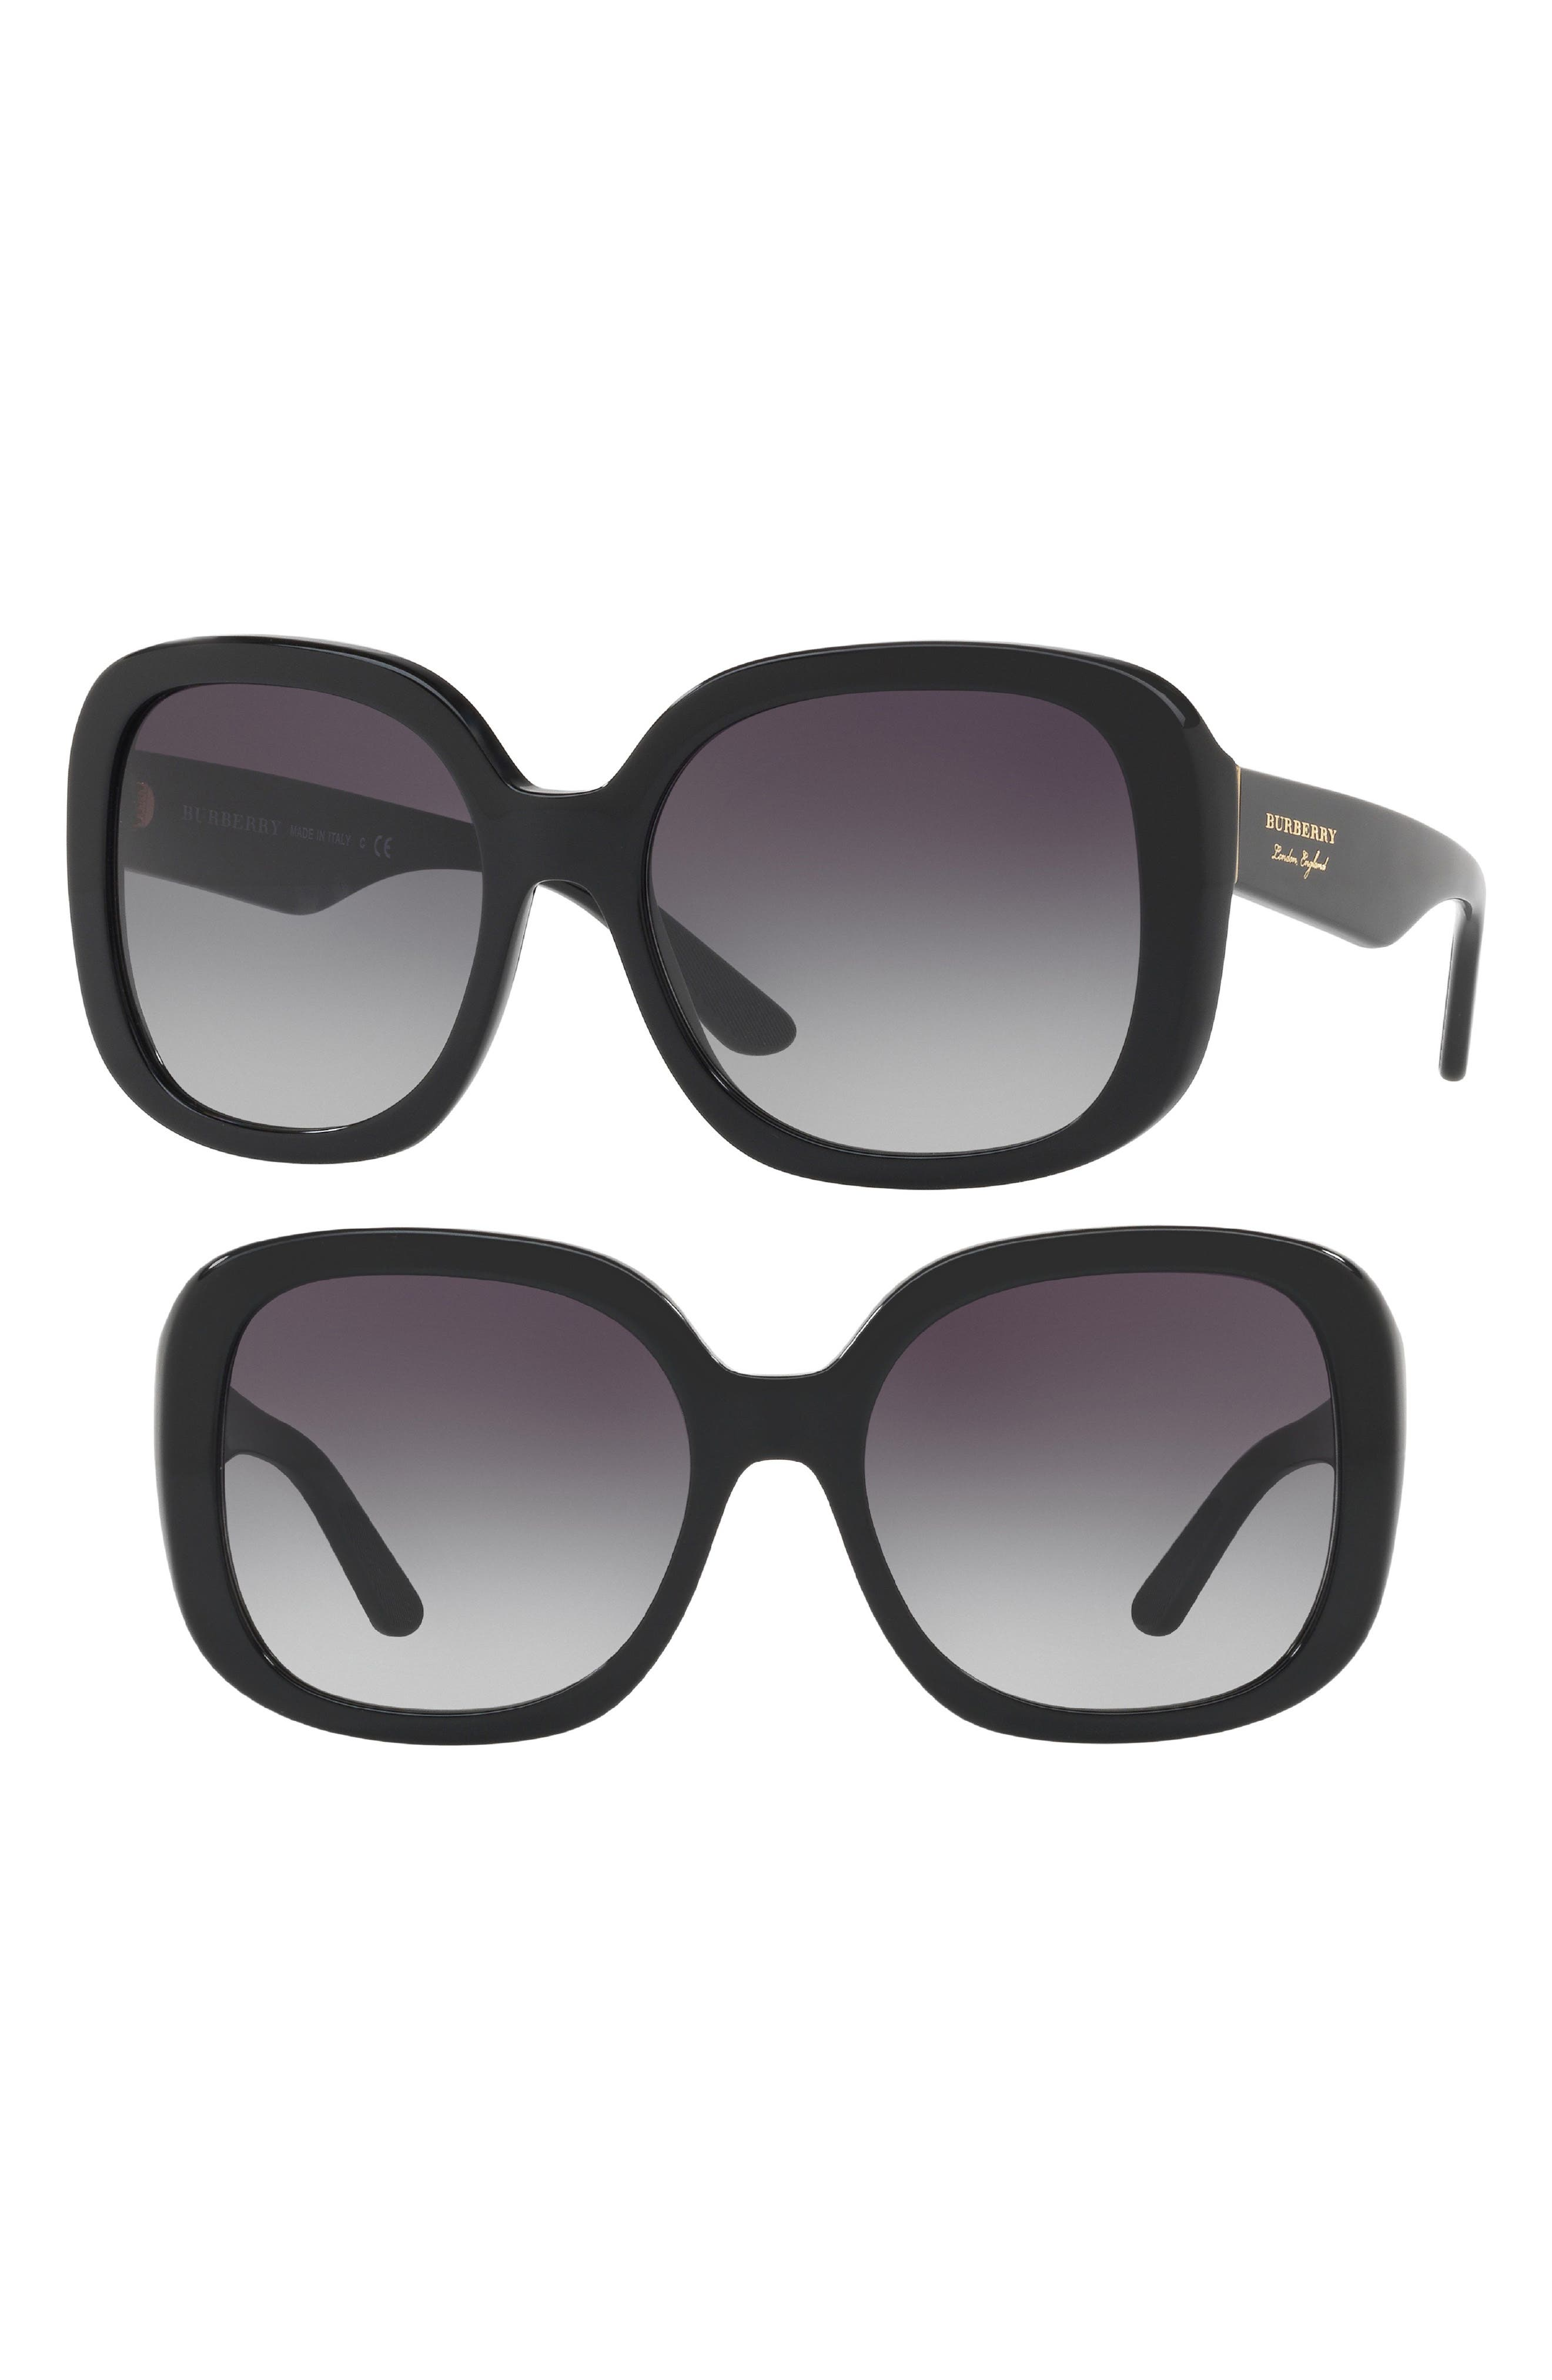 56mm Gradient Sunglasses,                             Alternate thumbnail 2, color,                             001